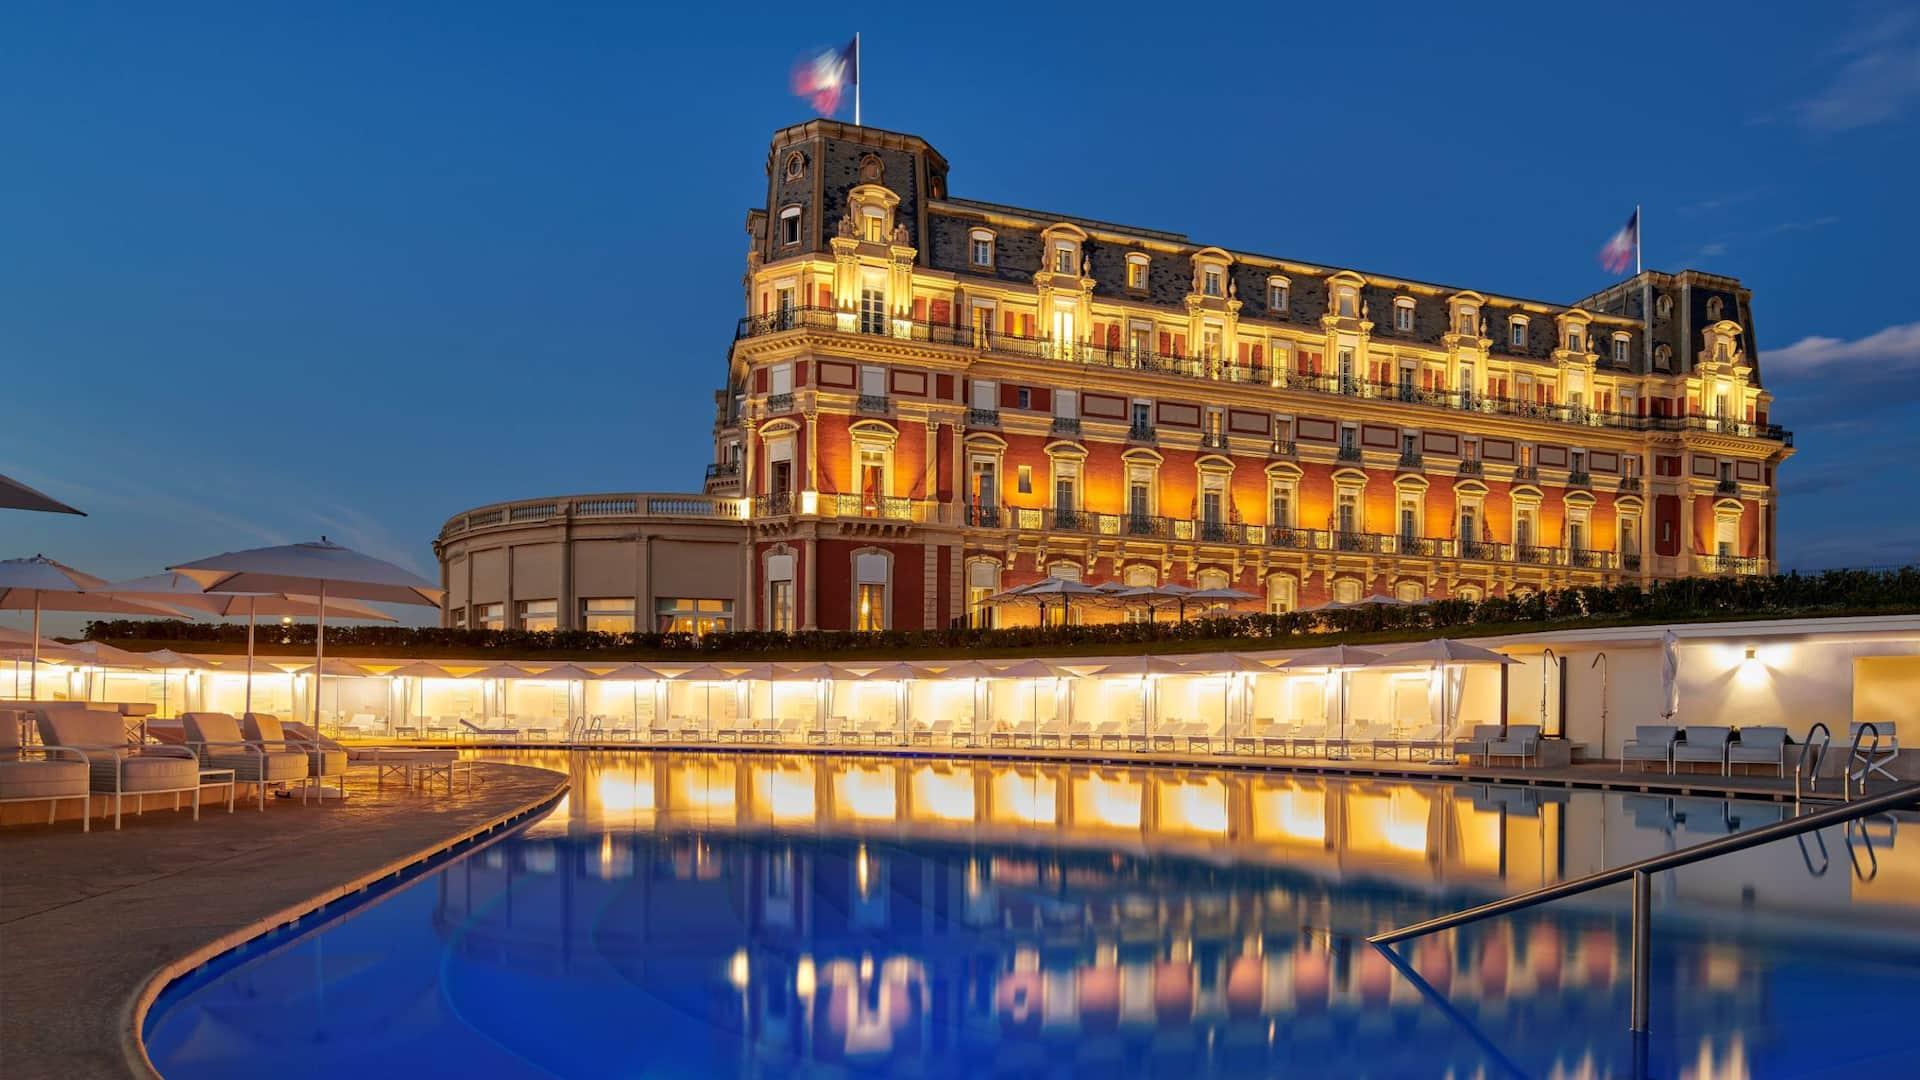 Hotel du palis biaritz